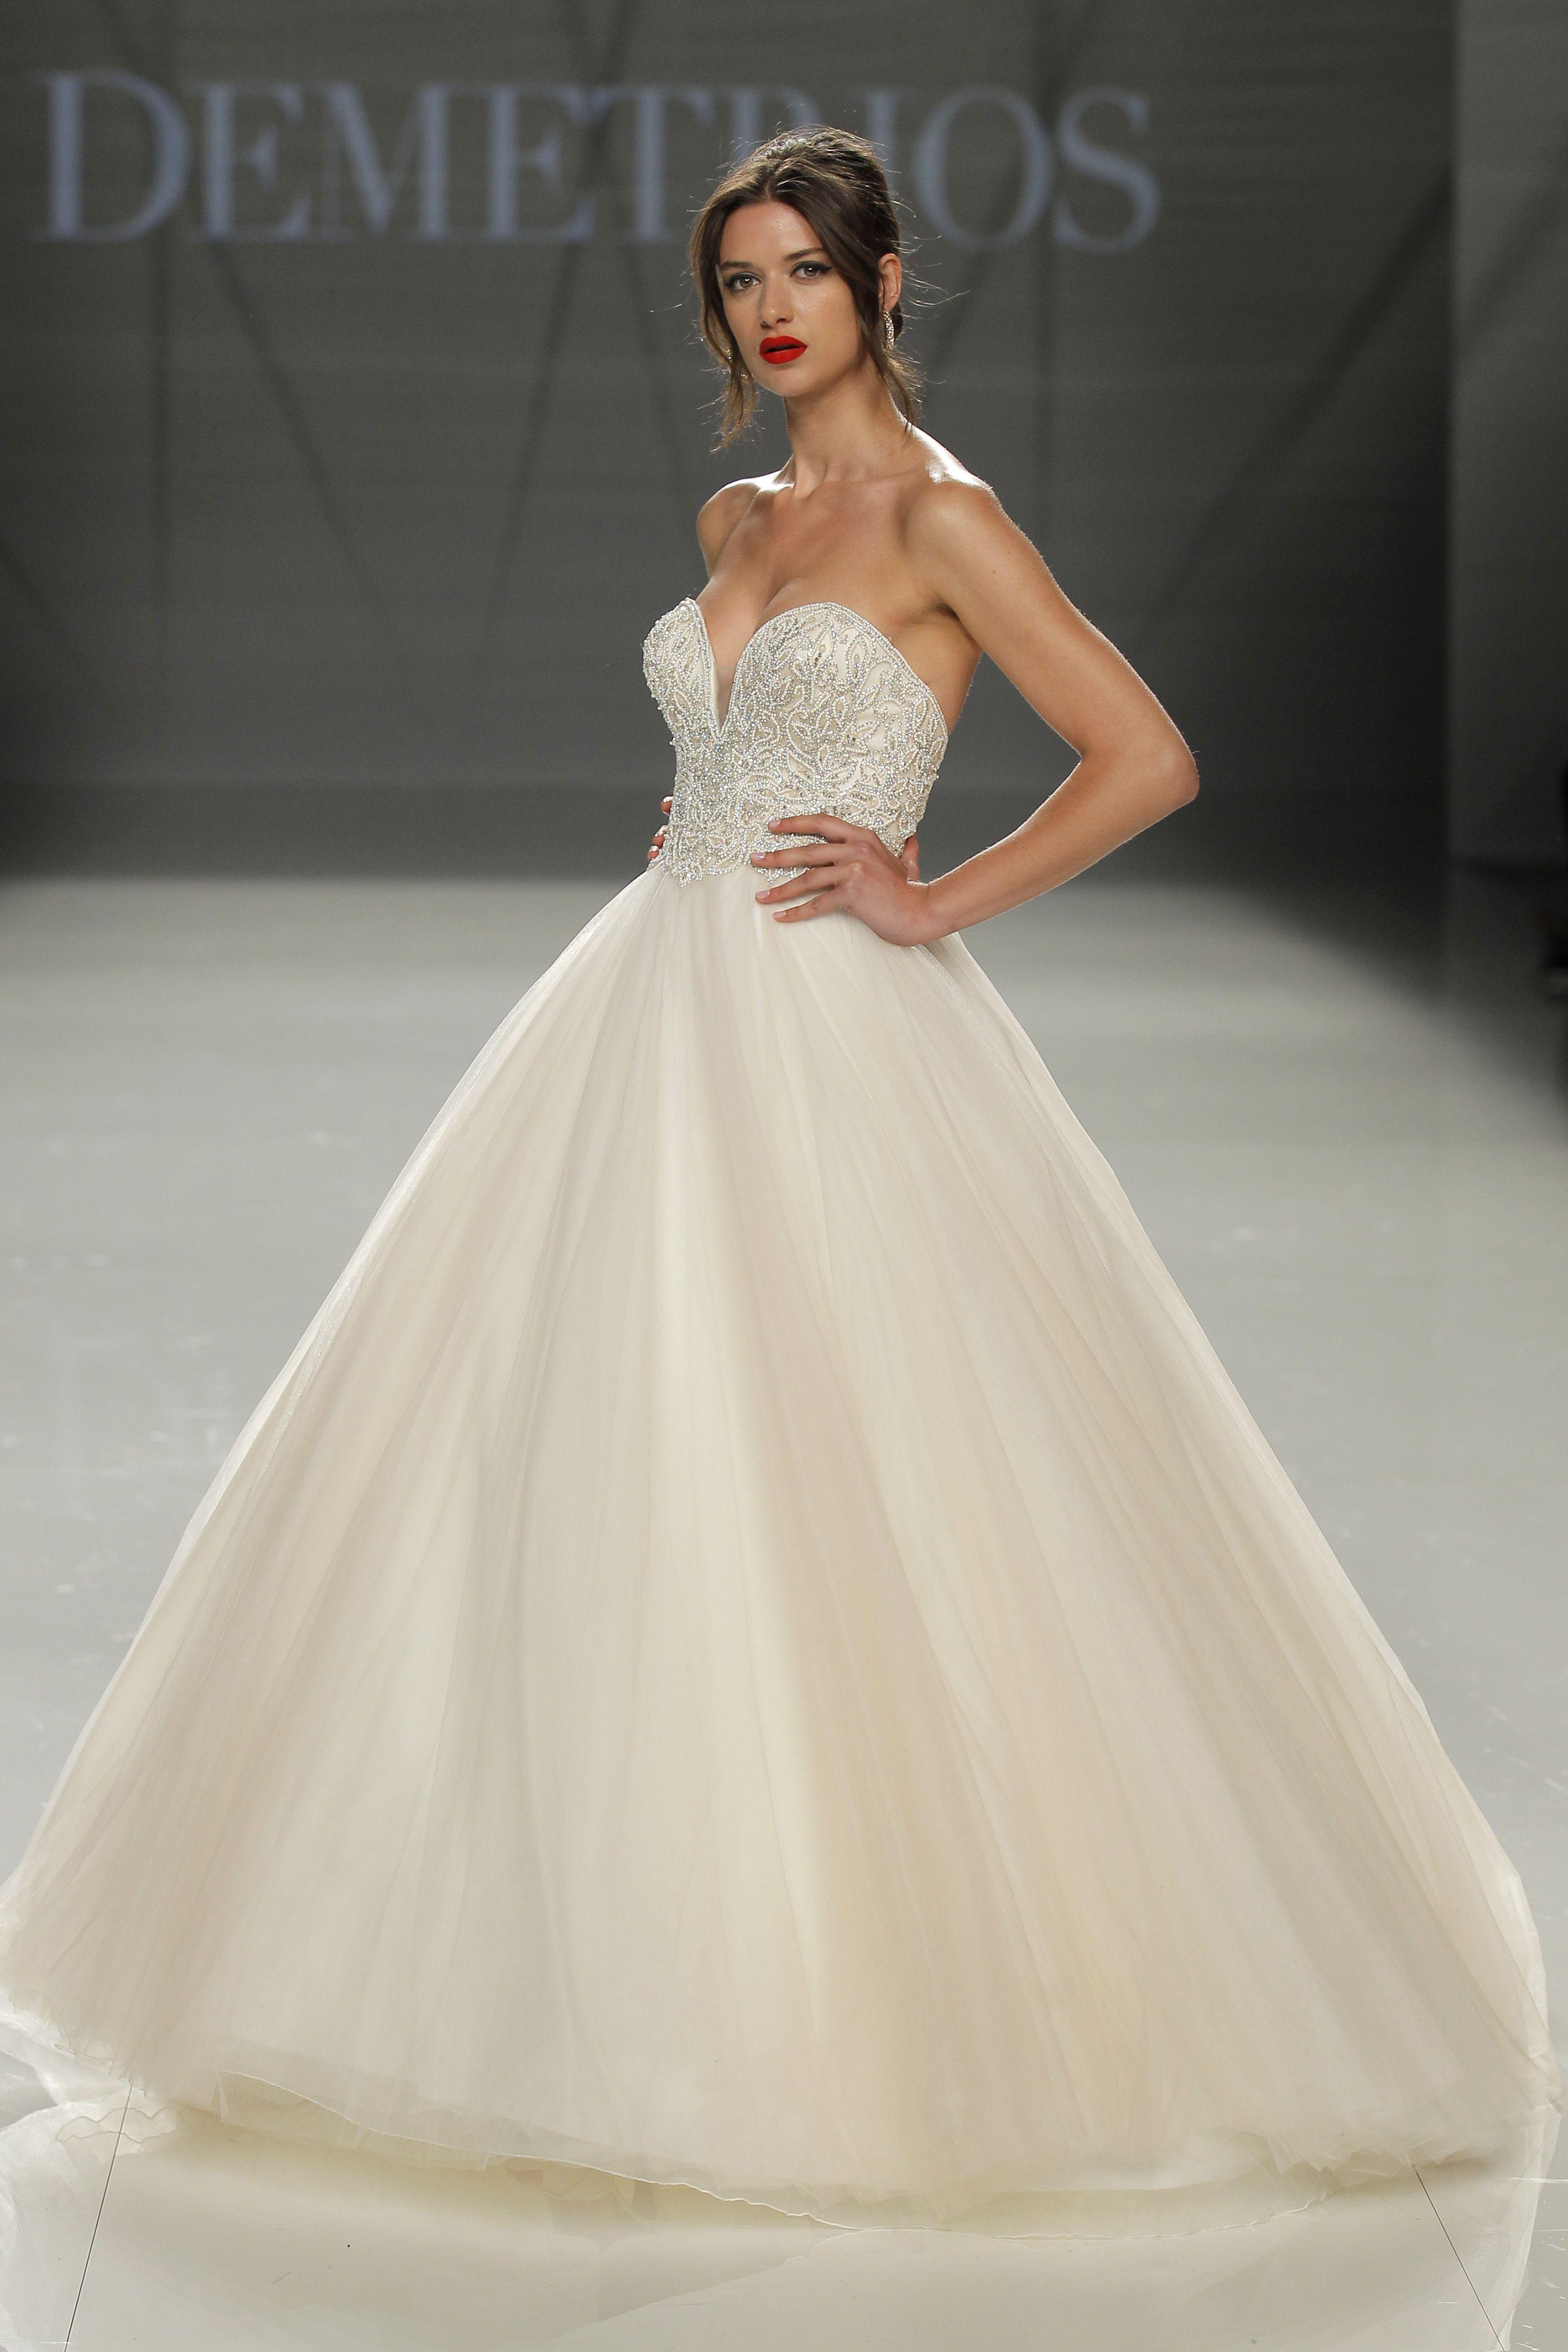 Vestido de noiva de demetrios dmt corte princesa decote